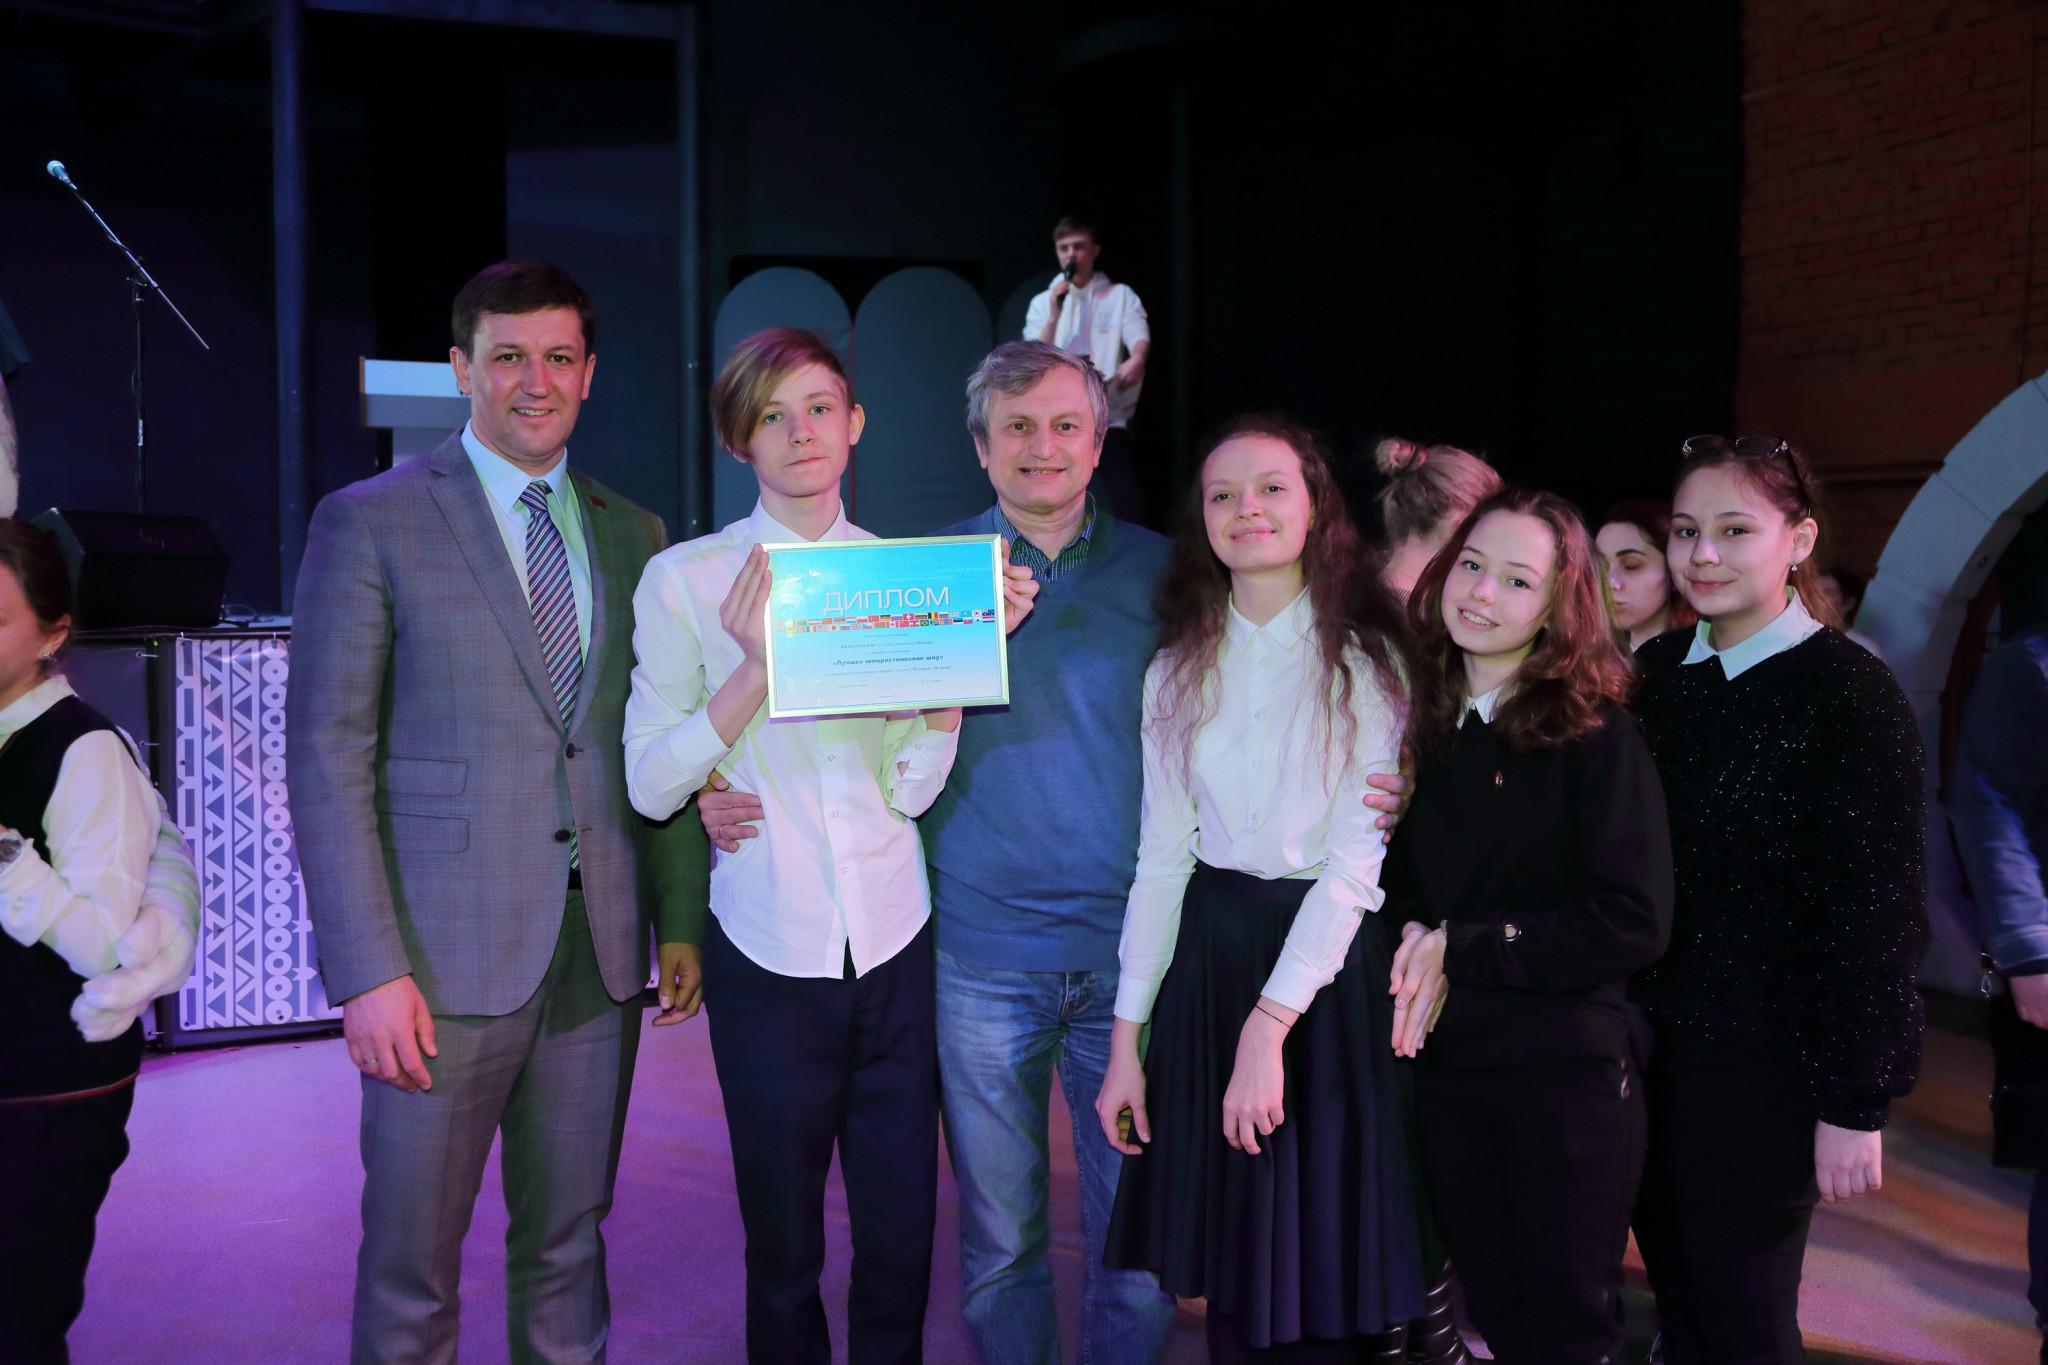 Students who made a video on South Korea won the contest ©Krasnoyarsk 2019